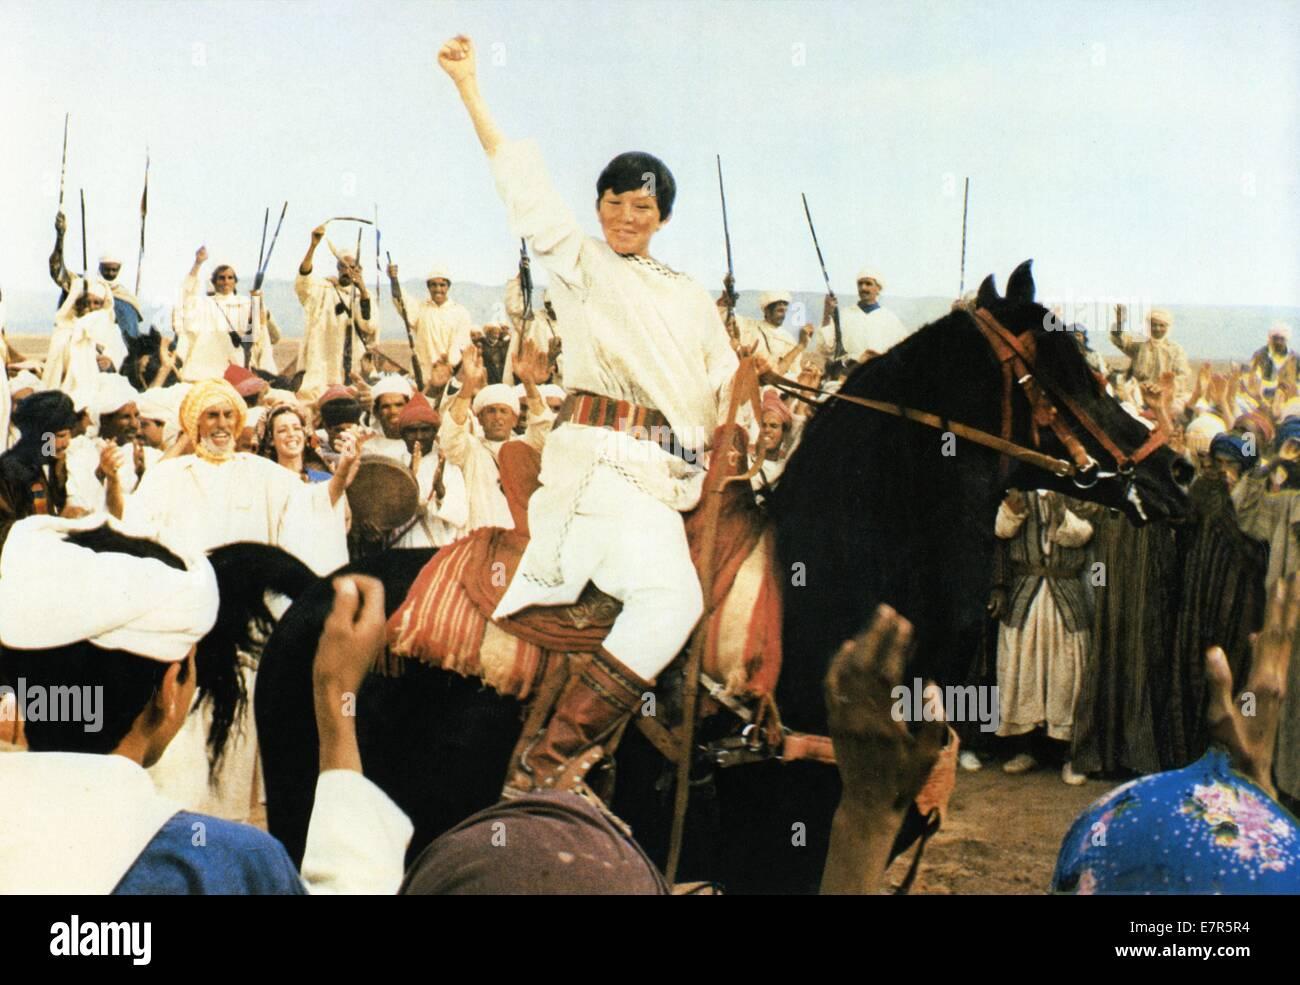 the black stallion returns free movie